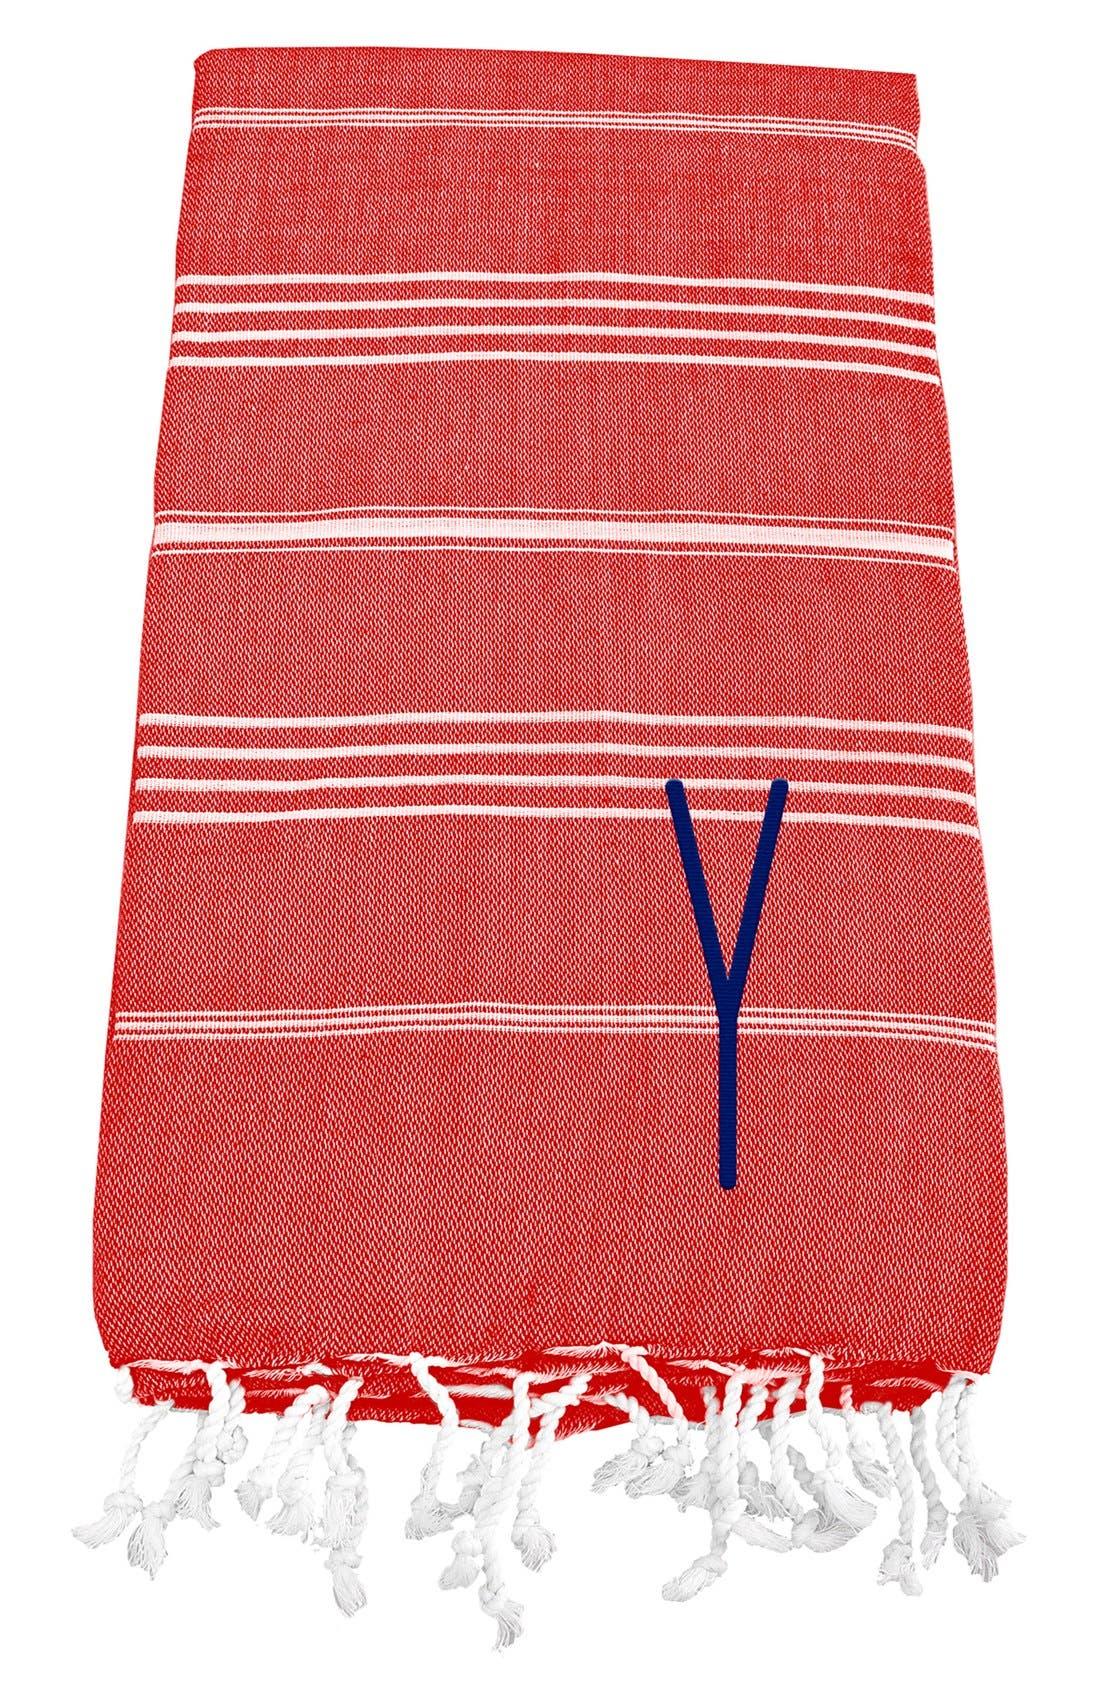 Monogram Turkish Cotton Towel,                             Main thumbnail 134, color,